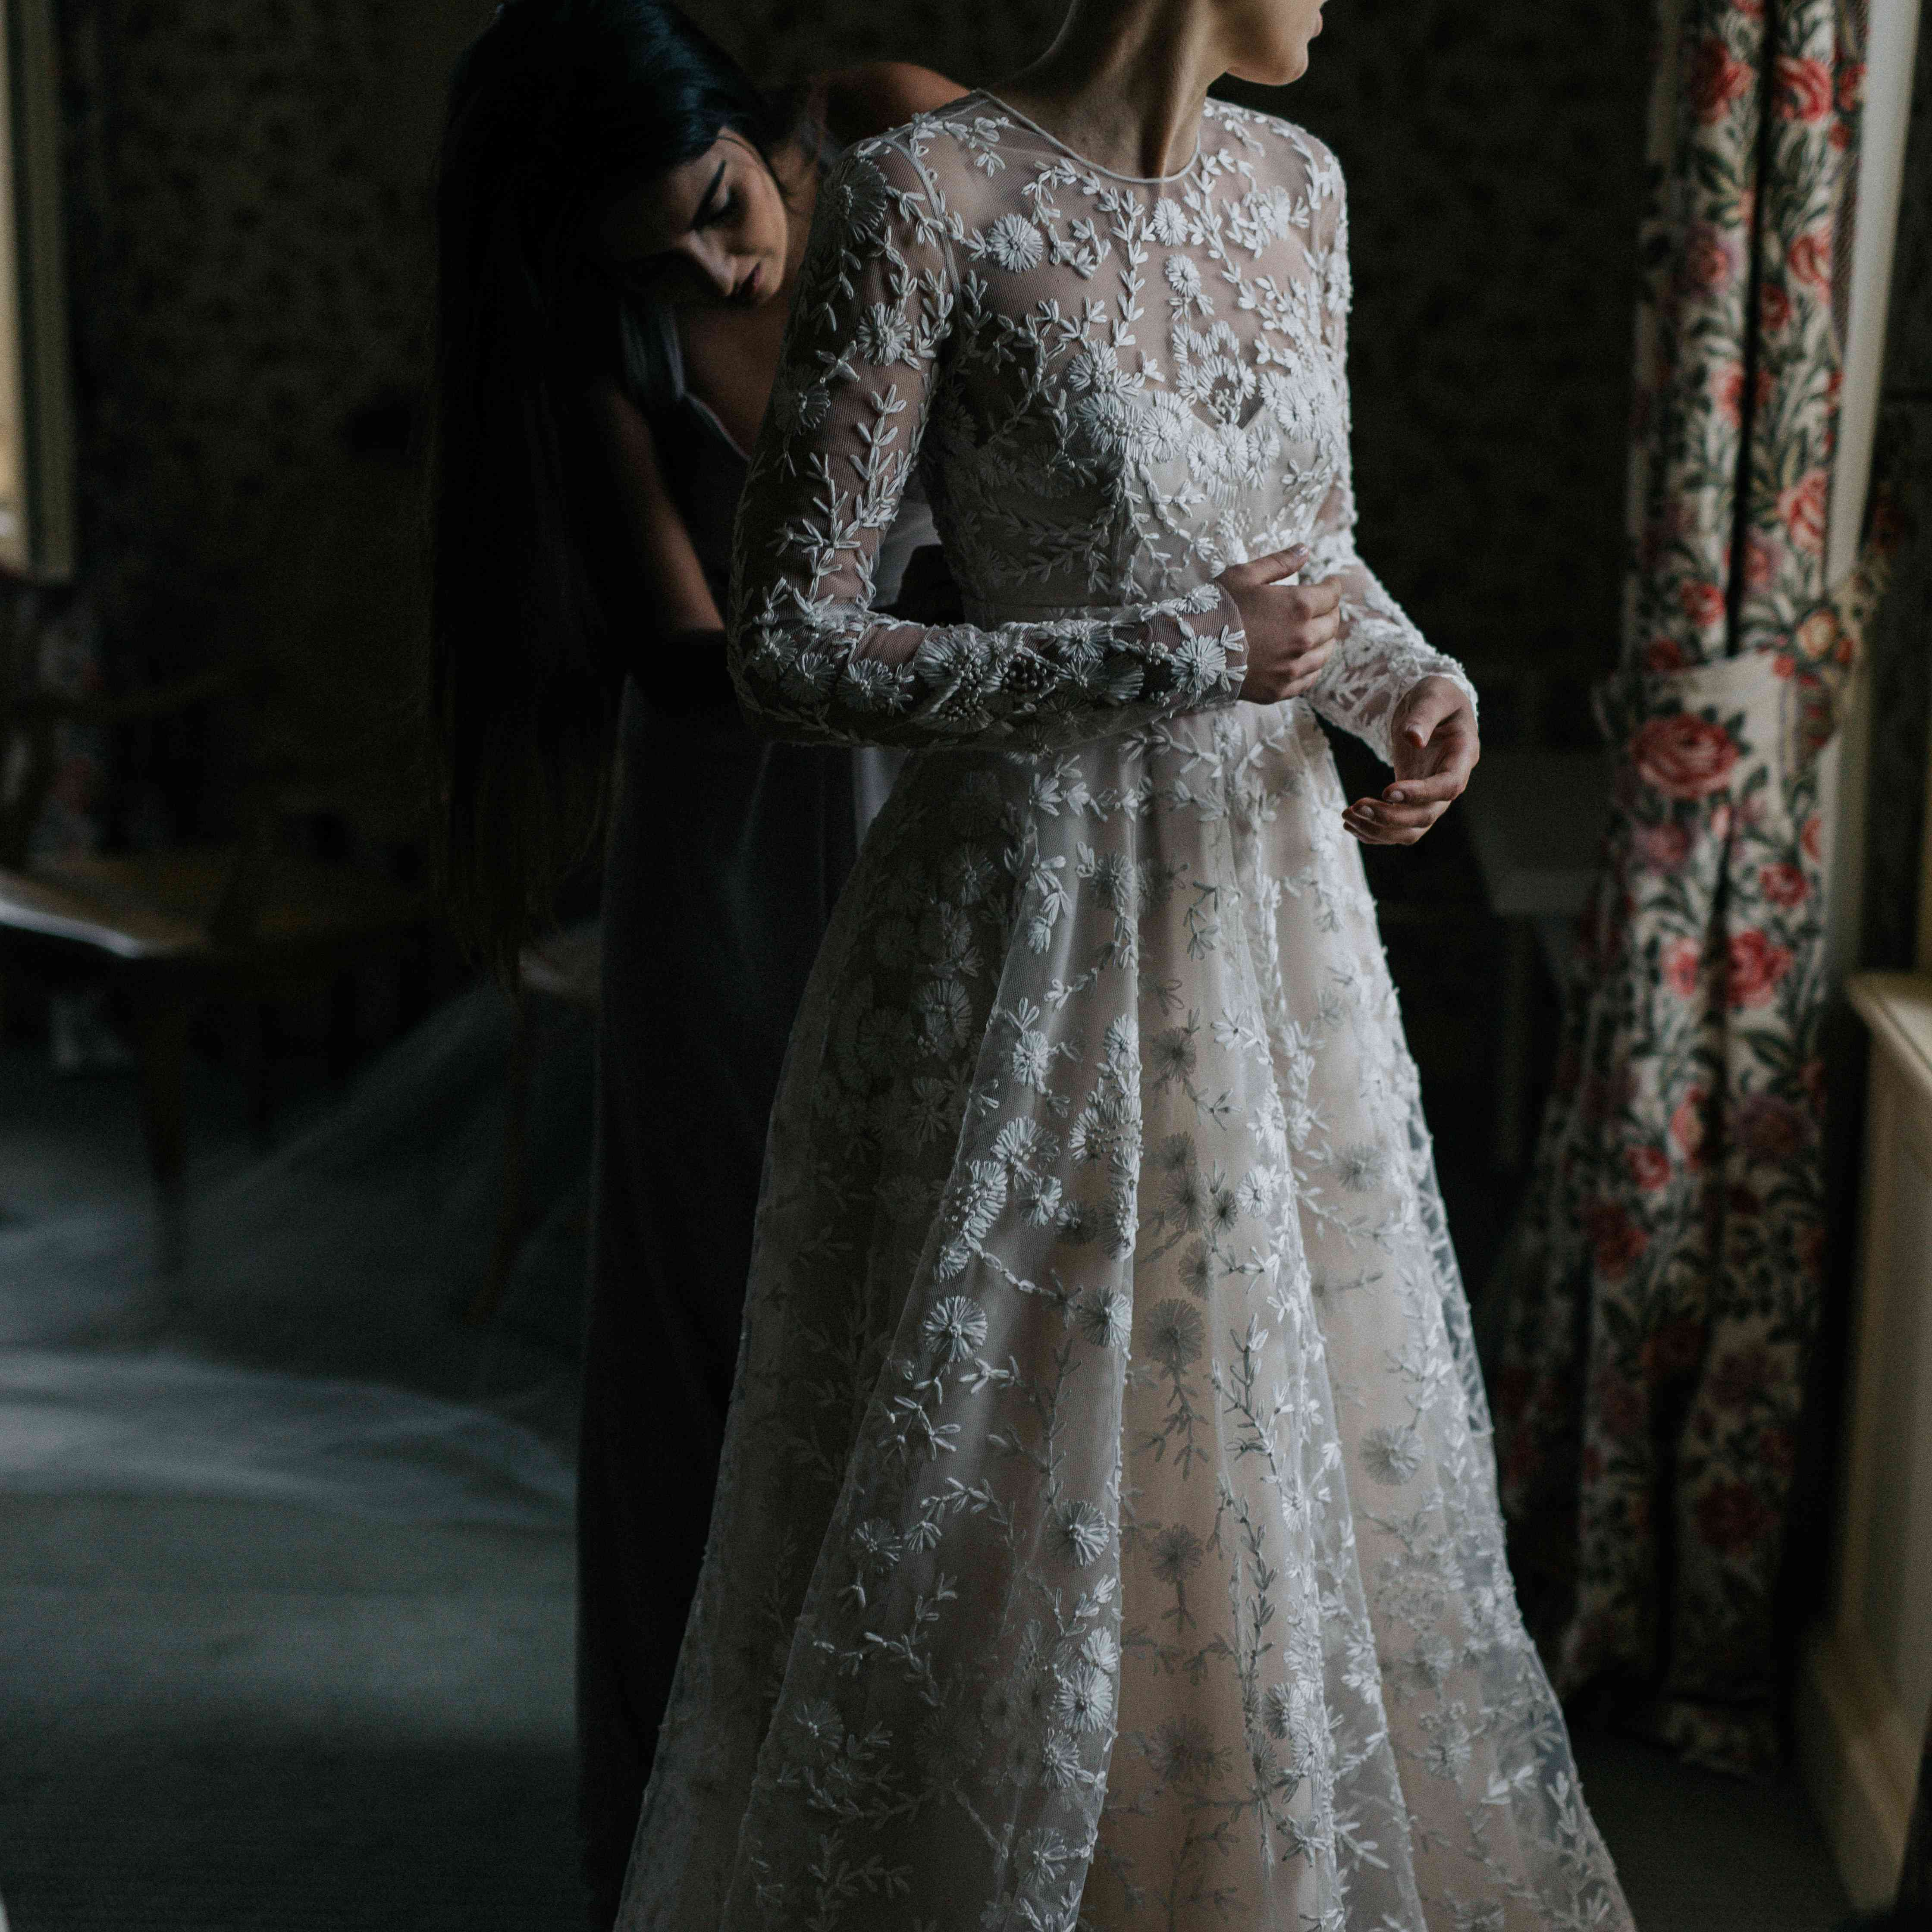 helping the bride getting ready long sleeve wedding dress